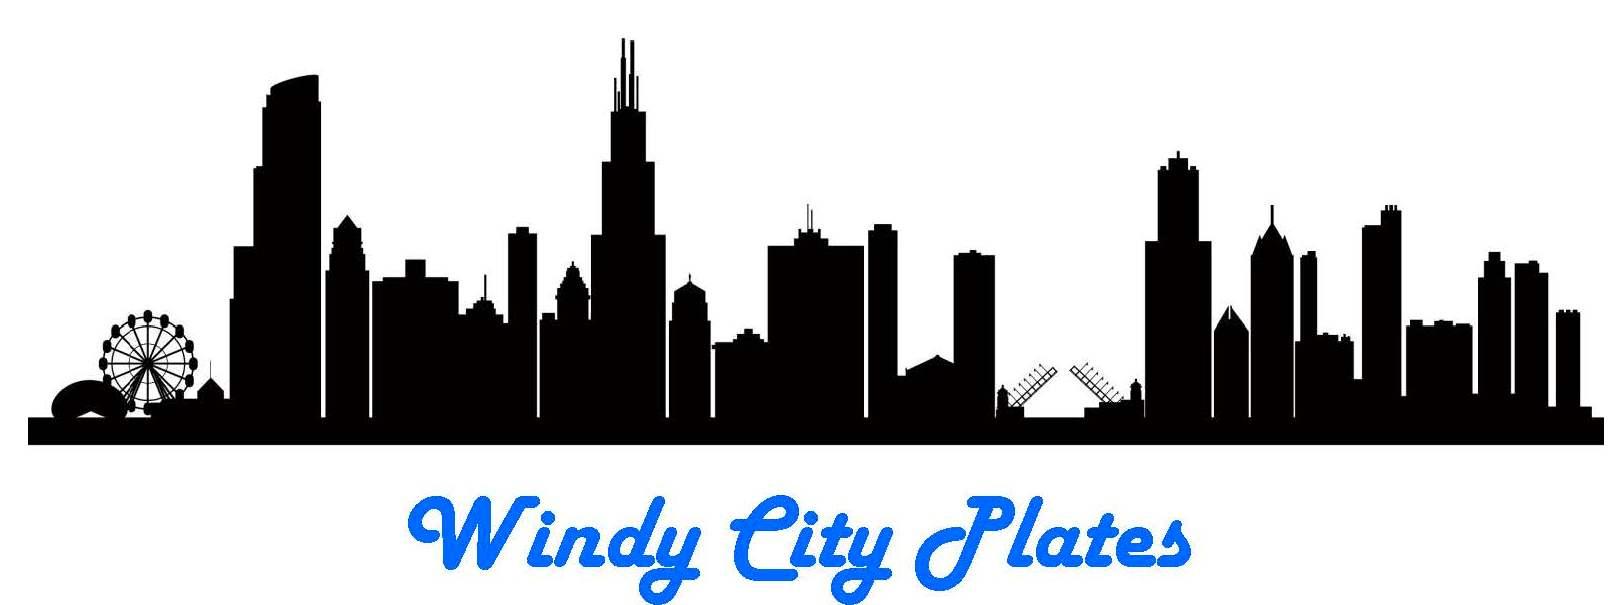 Windy City Plates